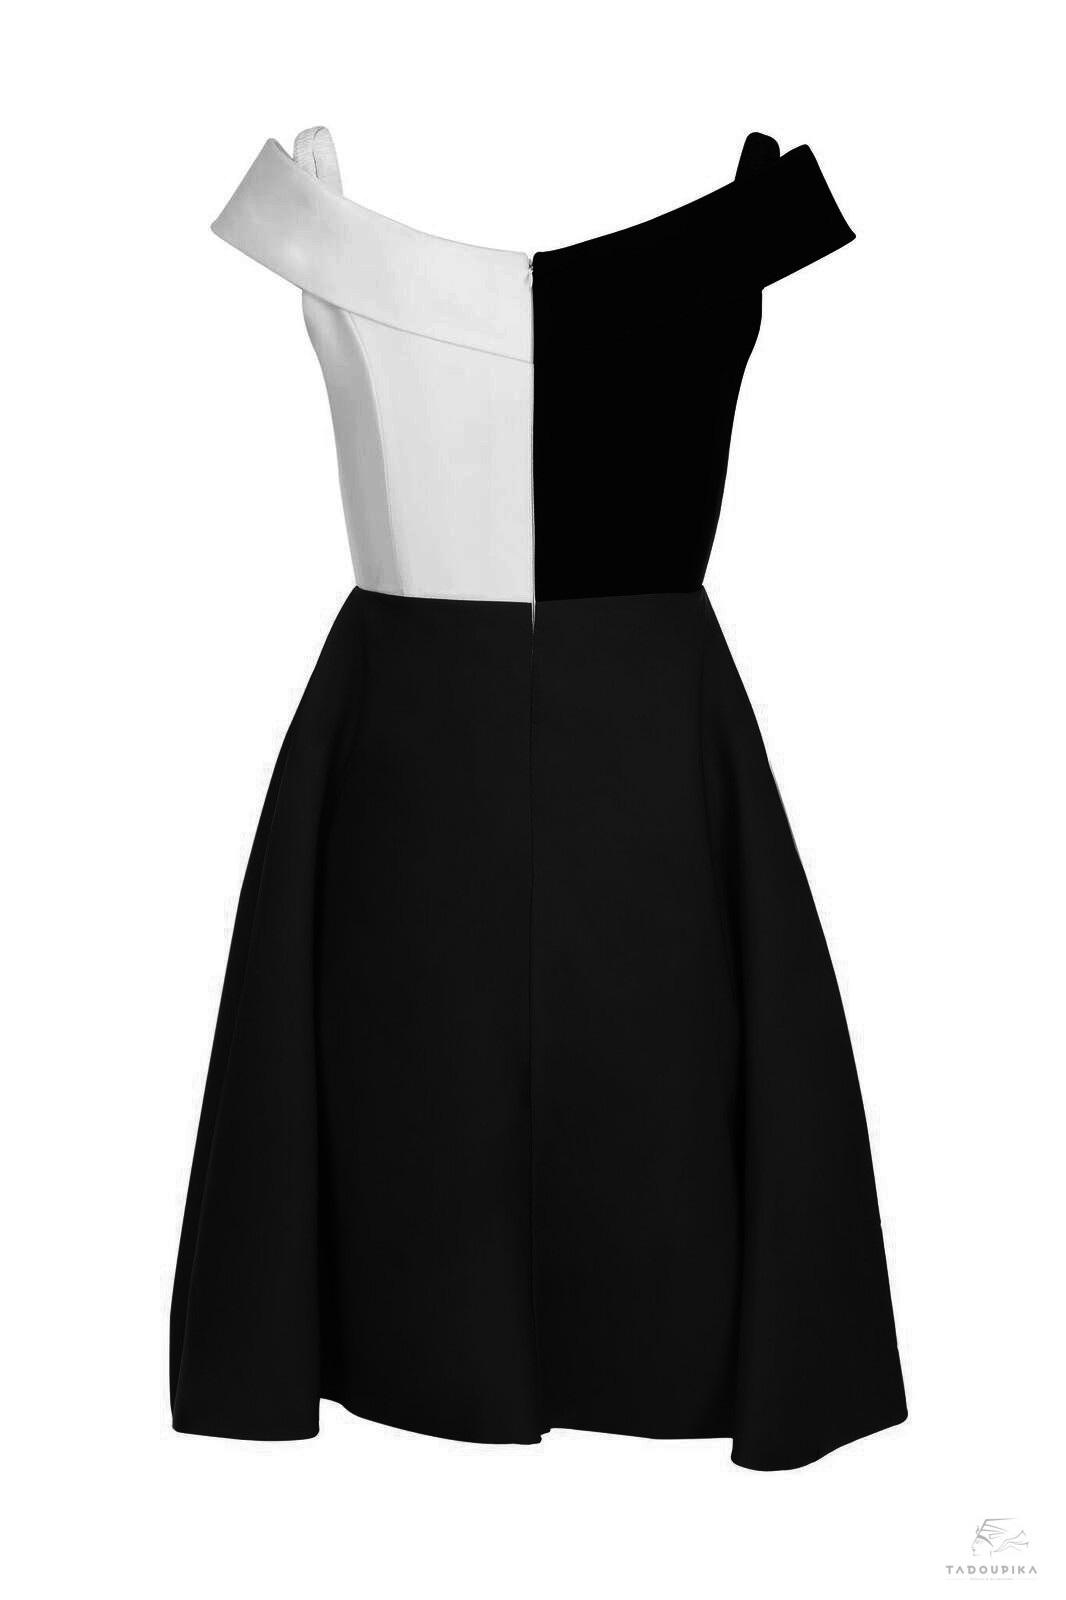 robe brigitte noire blanc contrast illusion dress custom dress personnalisable plsu siz curve france mode femme magazine defile ete summer wedding garen party france dos tadoupika